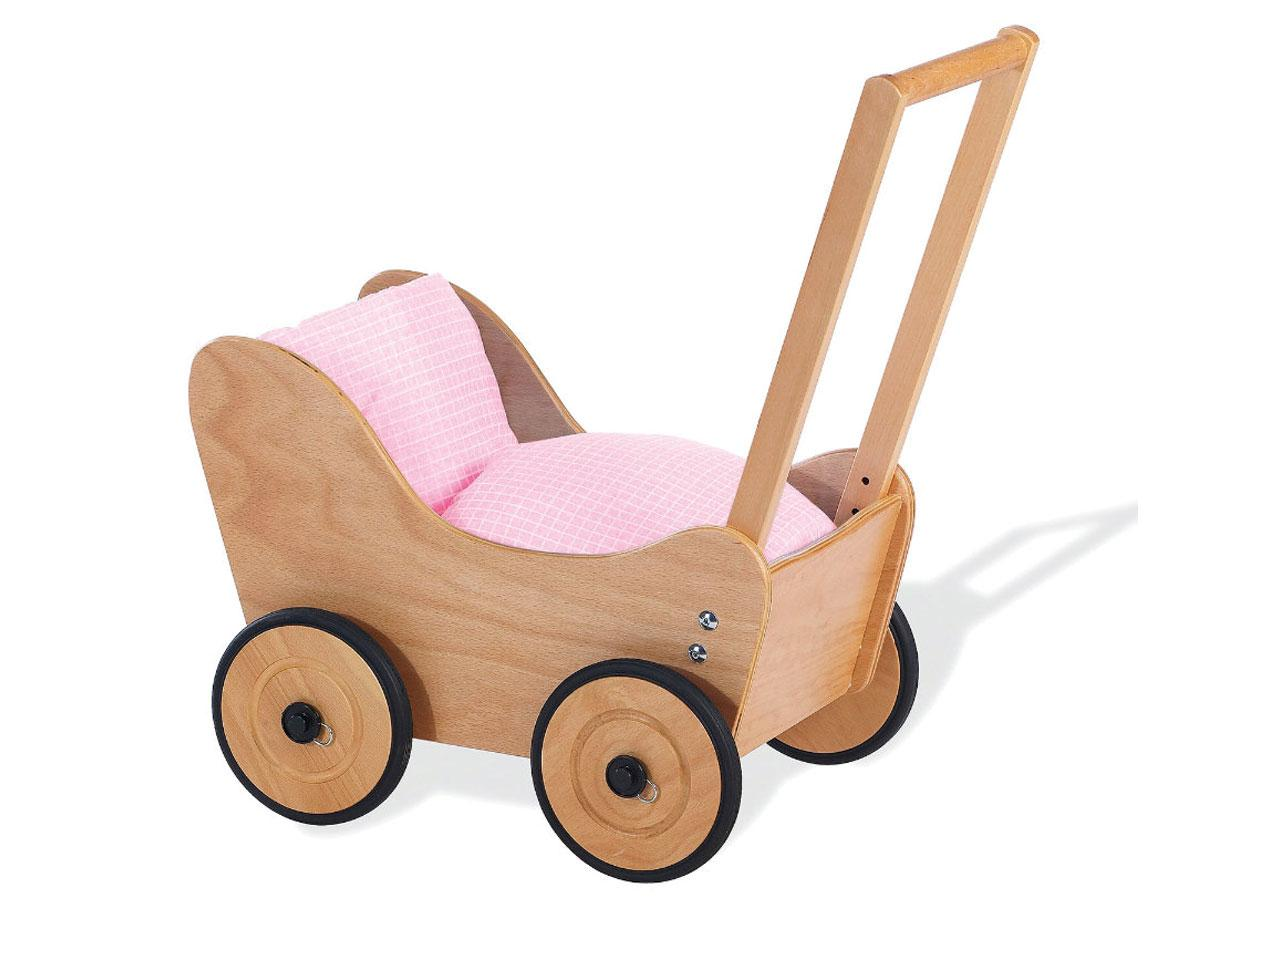 Kočárek pro panenky PINOLINO Doll Pram Sarah, dřevěný